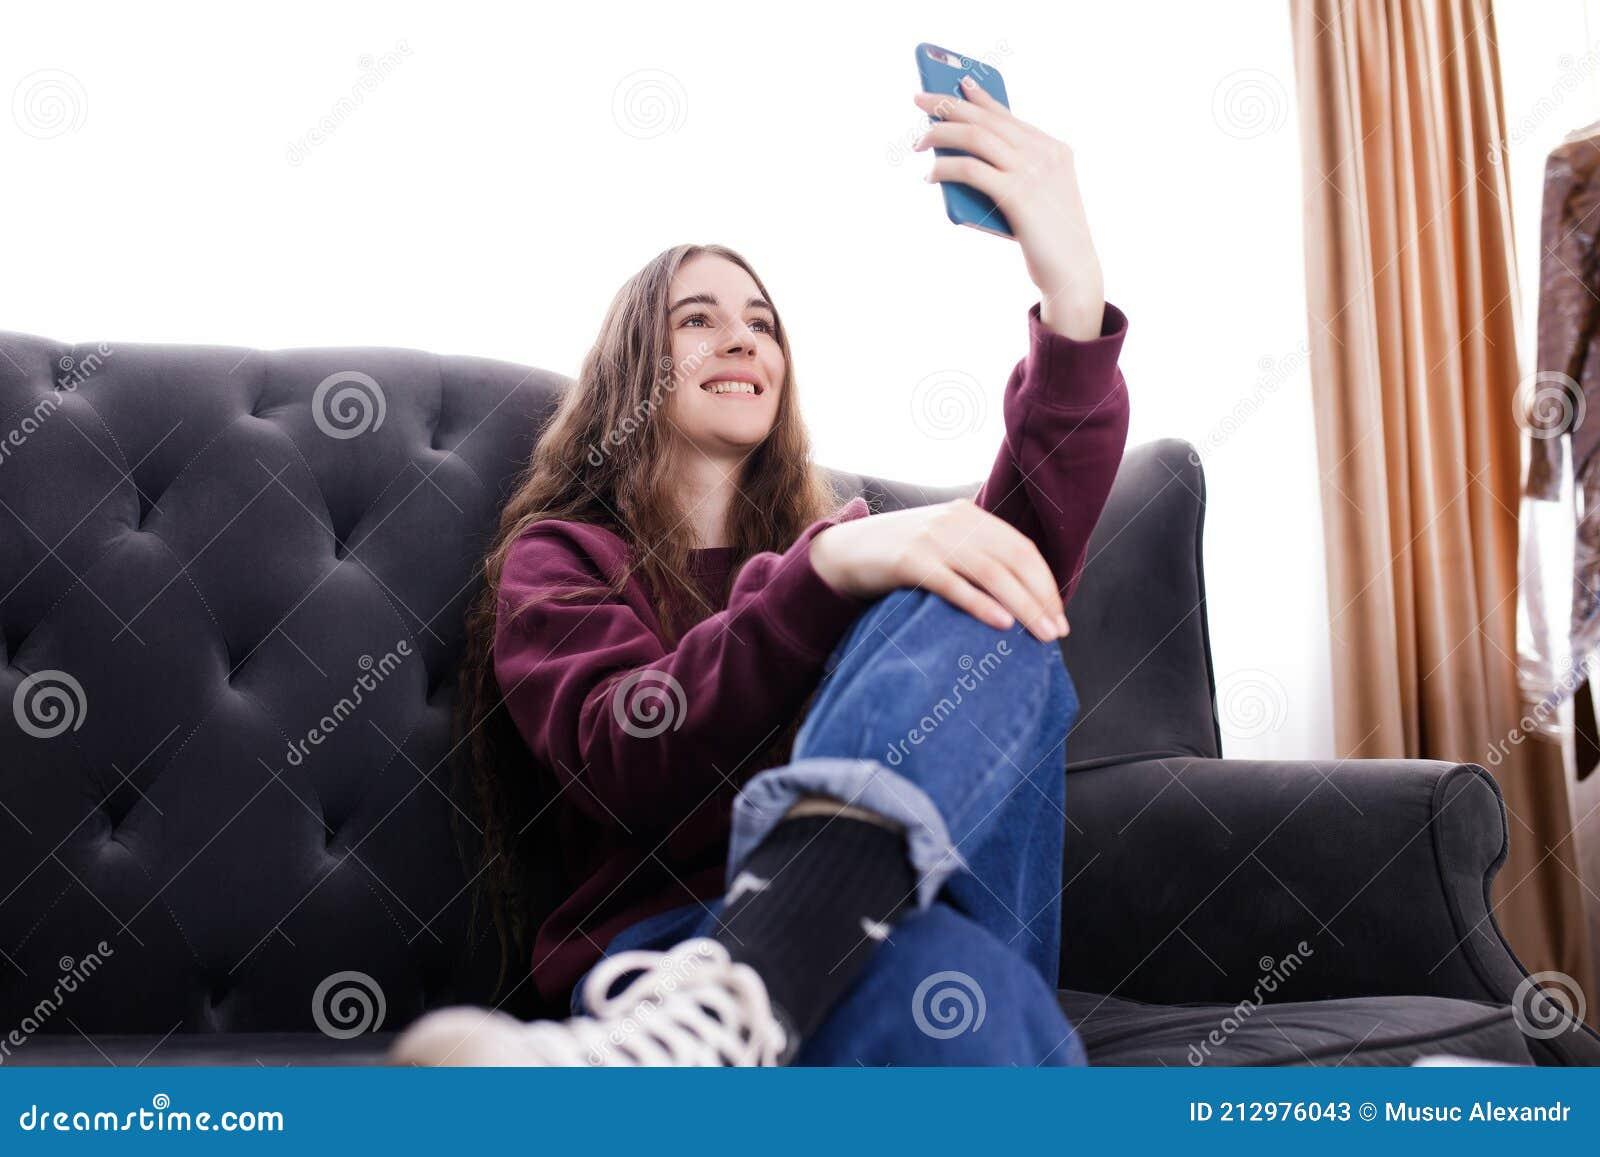 Teen webcam free Webcam Chat